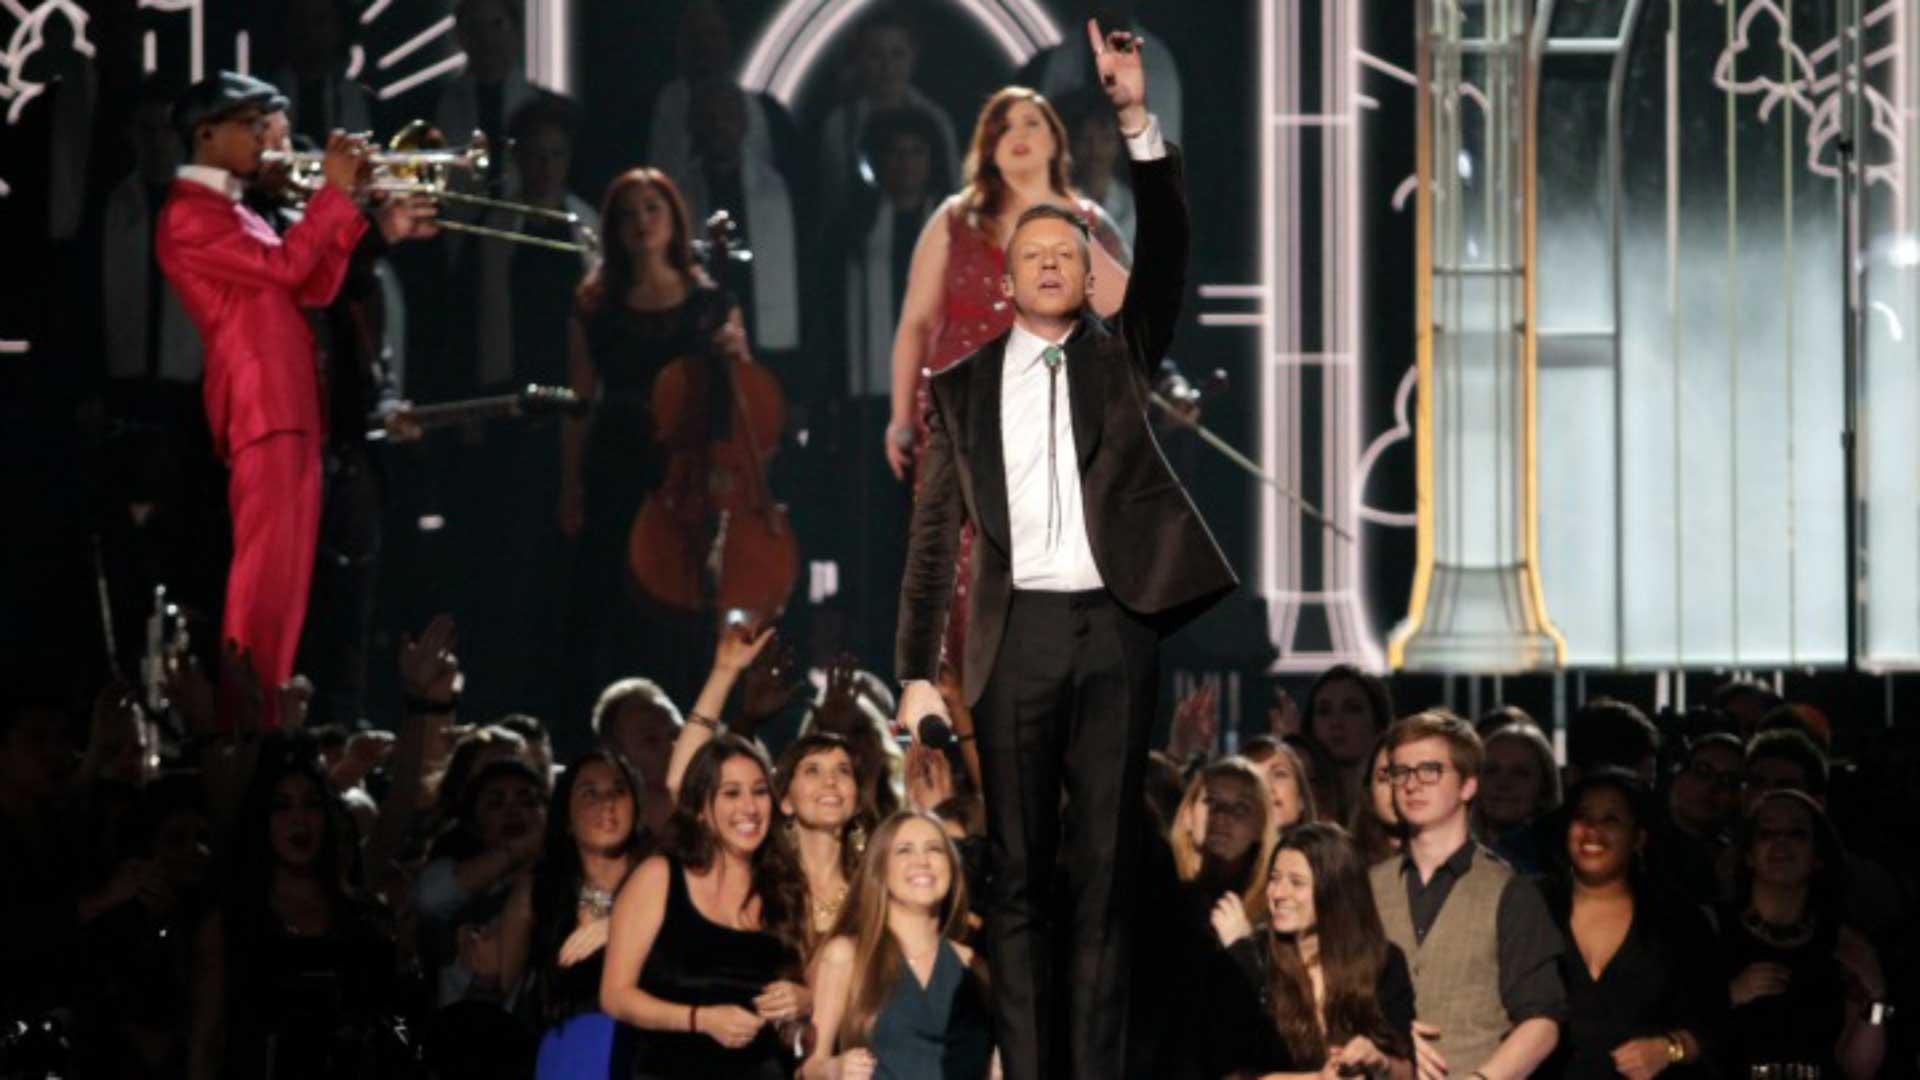 Macklemore & Ryan Lewis, Mary Lambert, Queen Latifah, Madonna, and Trombone Shorty perform